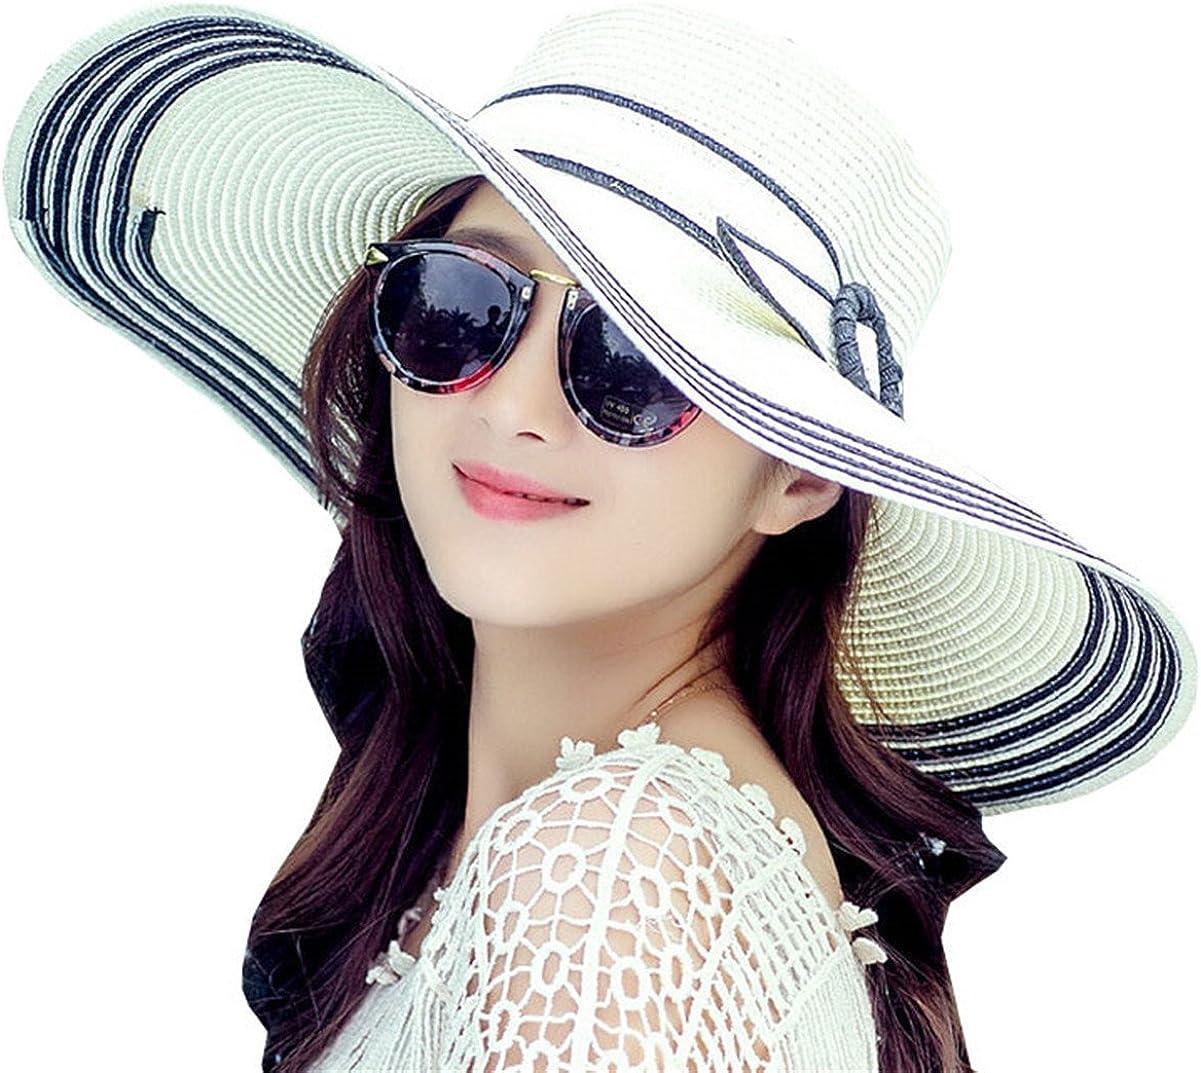 Women's Large Wide Brim Floppy Brim Summer Beach Sun Hat Foldable Straw Cap Party Garden Travel UPF40+ Sunscreen